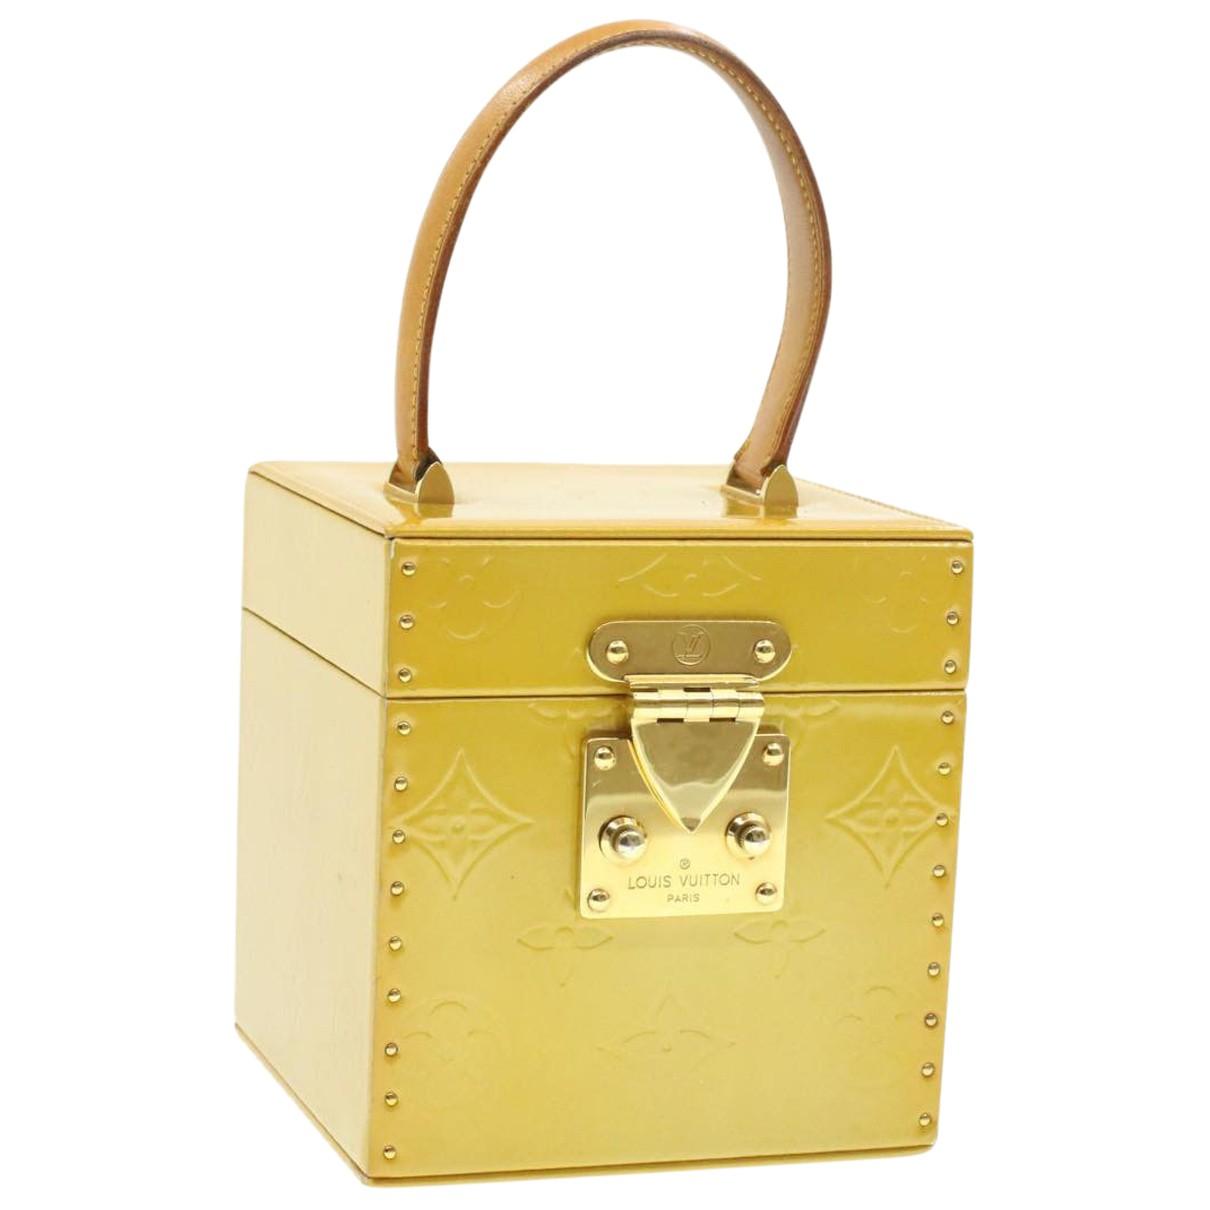 Louis Vuitton Bleecker Beige Patent leather handbag for Women N